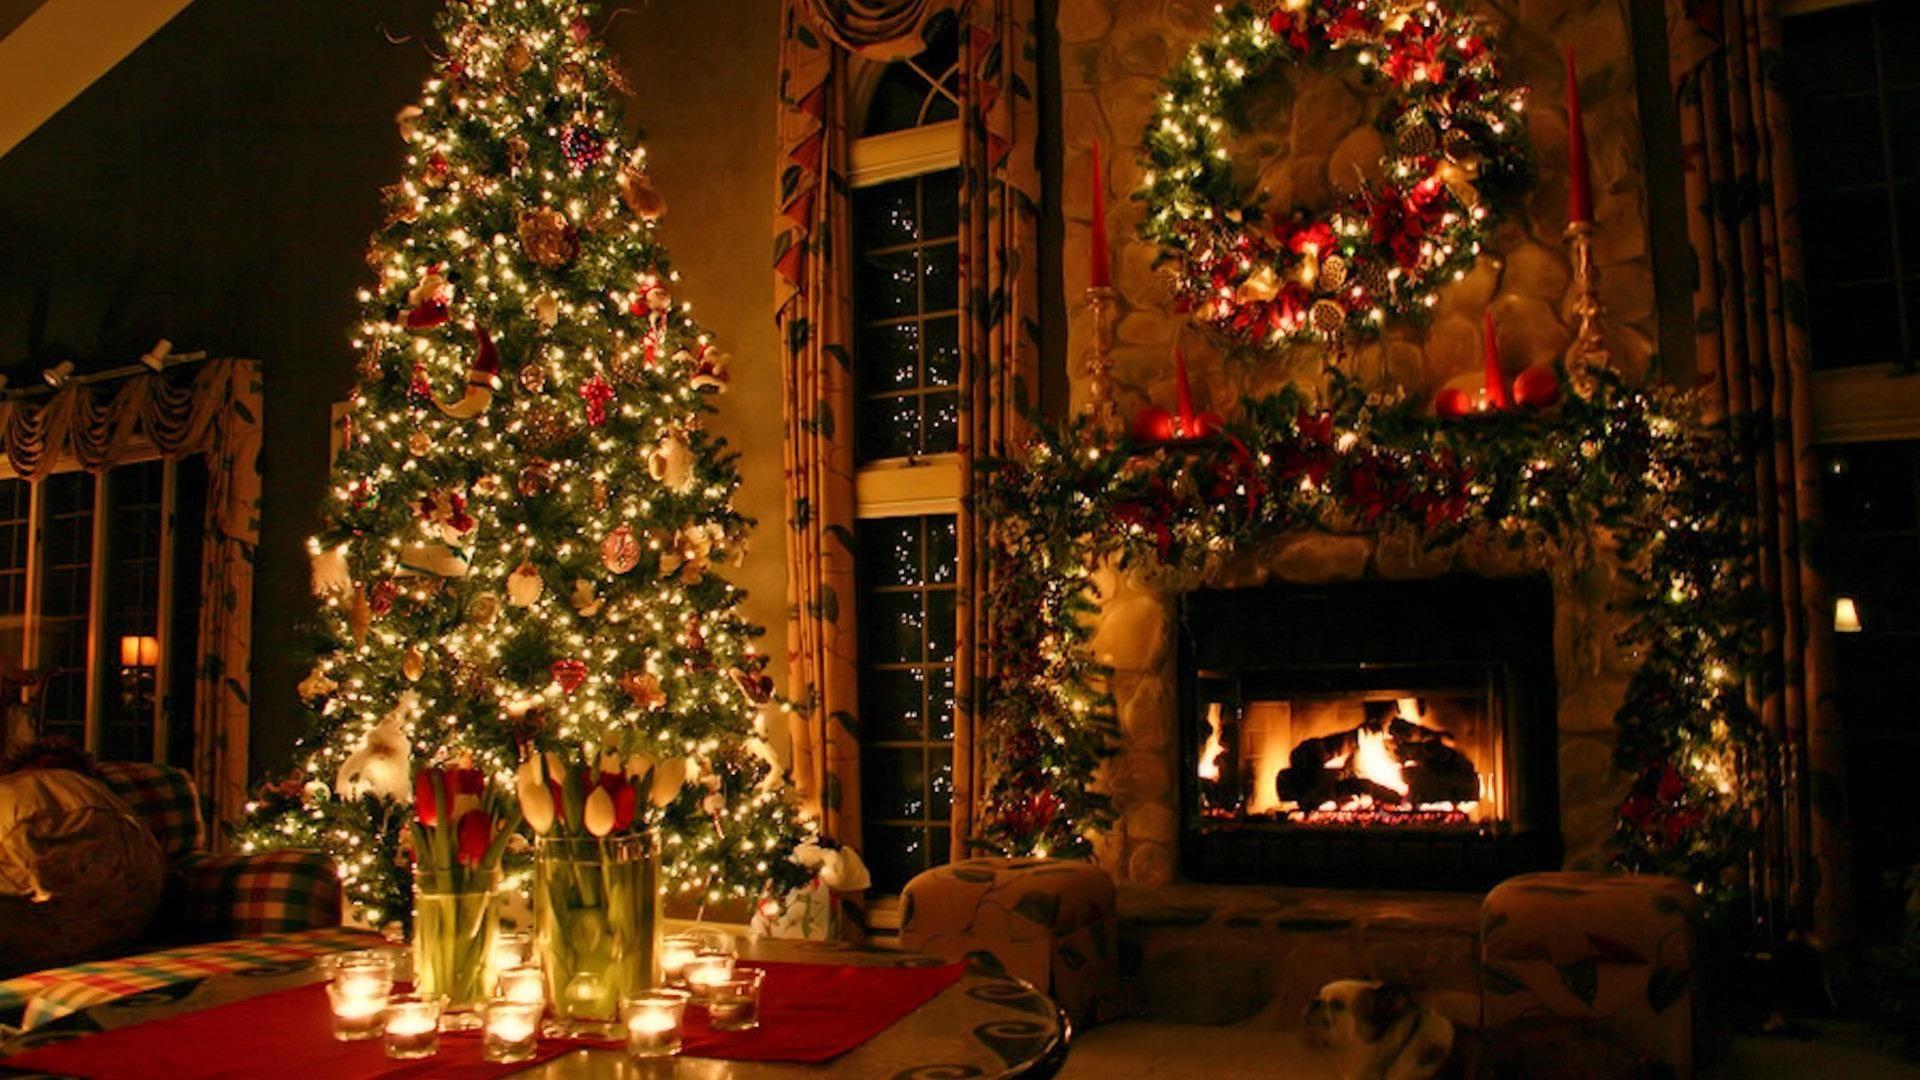 1920x1080 Christmas Pc Wallpaper Jnsrmgksb I Journal 1920x1080 1371 9 Kb Christmas Desktop Beautiful Christmas Trees Christmas Fireplace